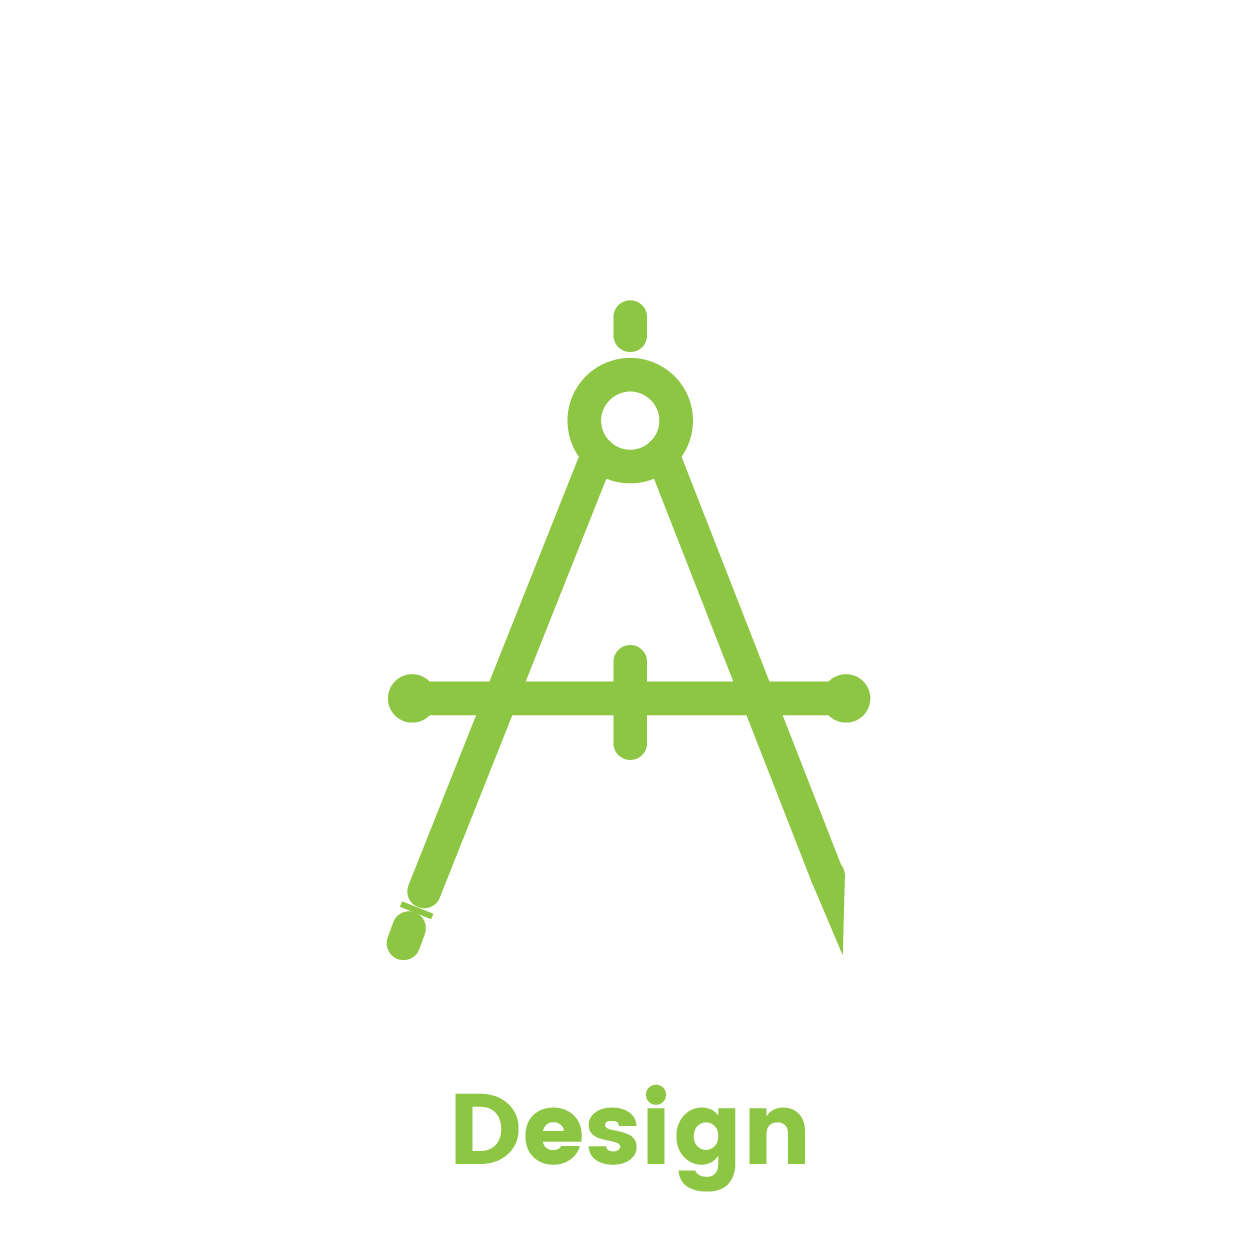 p4 PM - Design-01.png